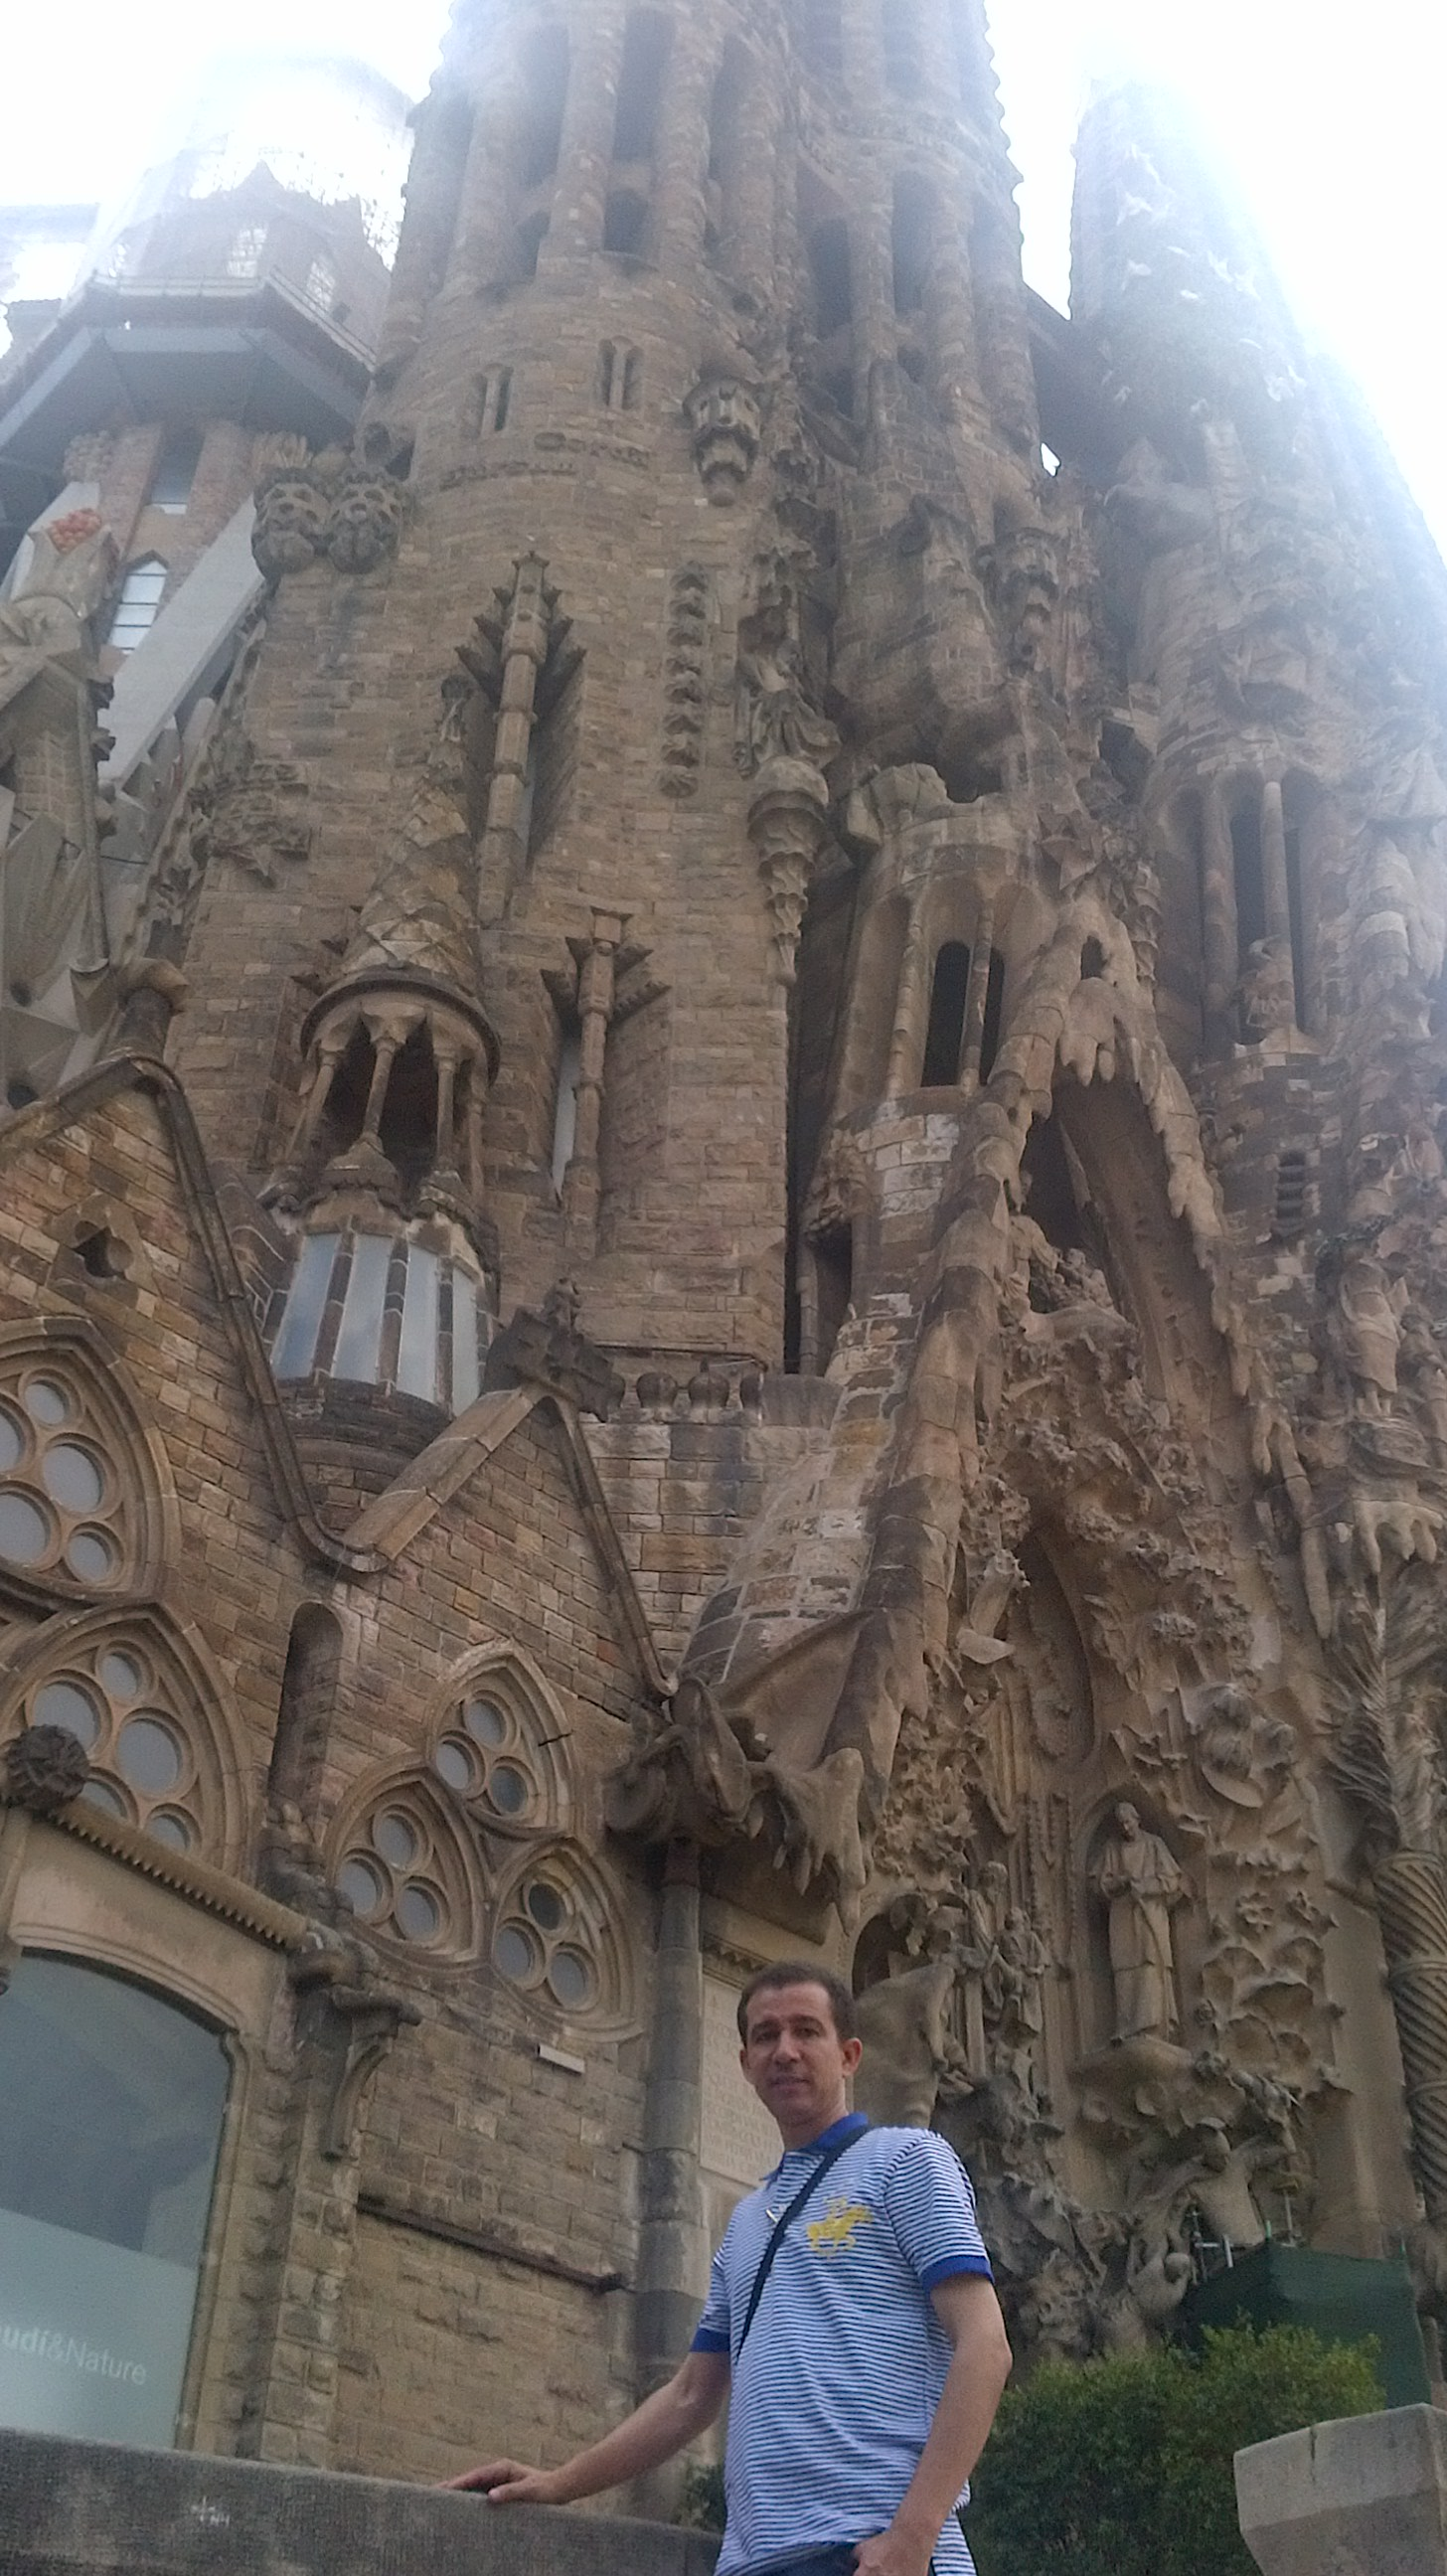 Dustin Muñoz en visita a Basílica la Sagrada Familia de Antoni Gaudi, Barcelona, España, 2014.